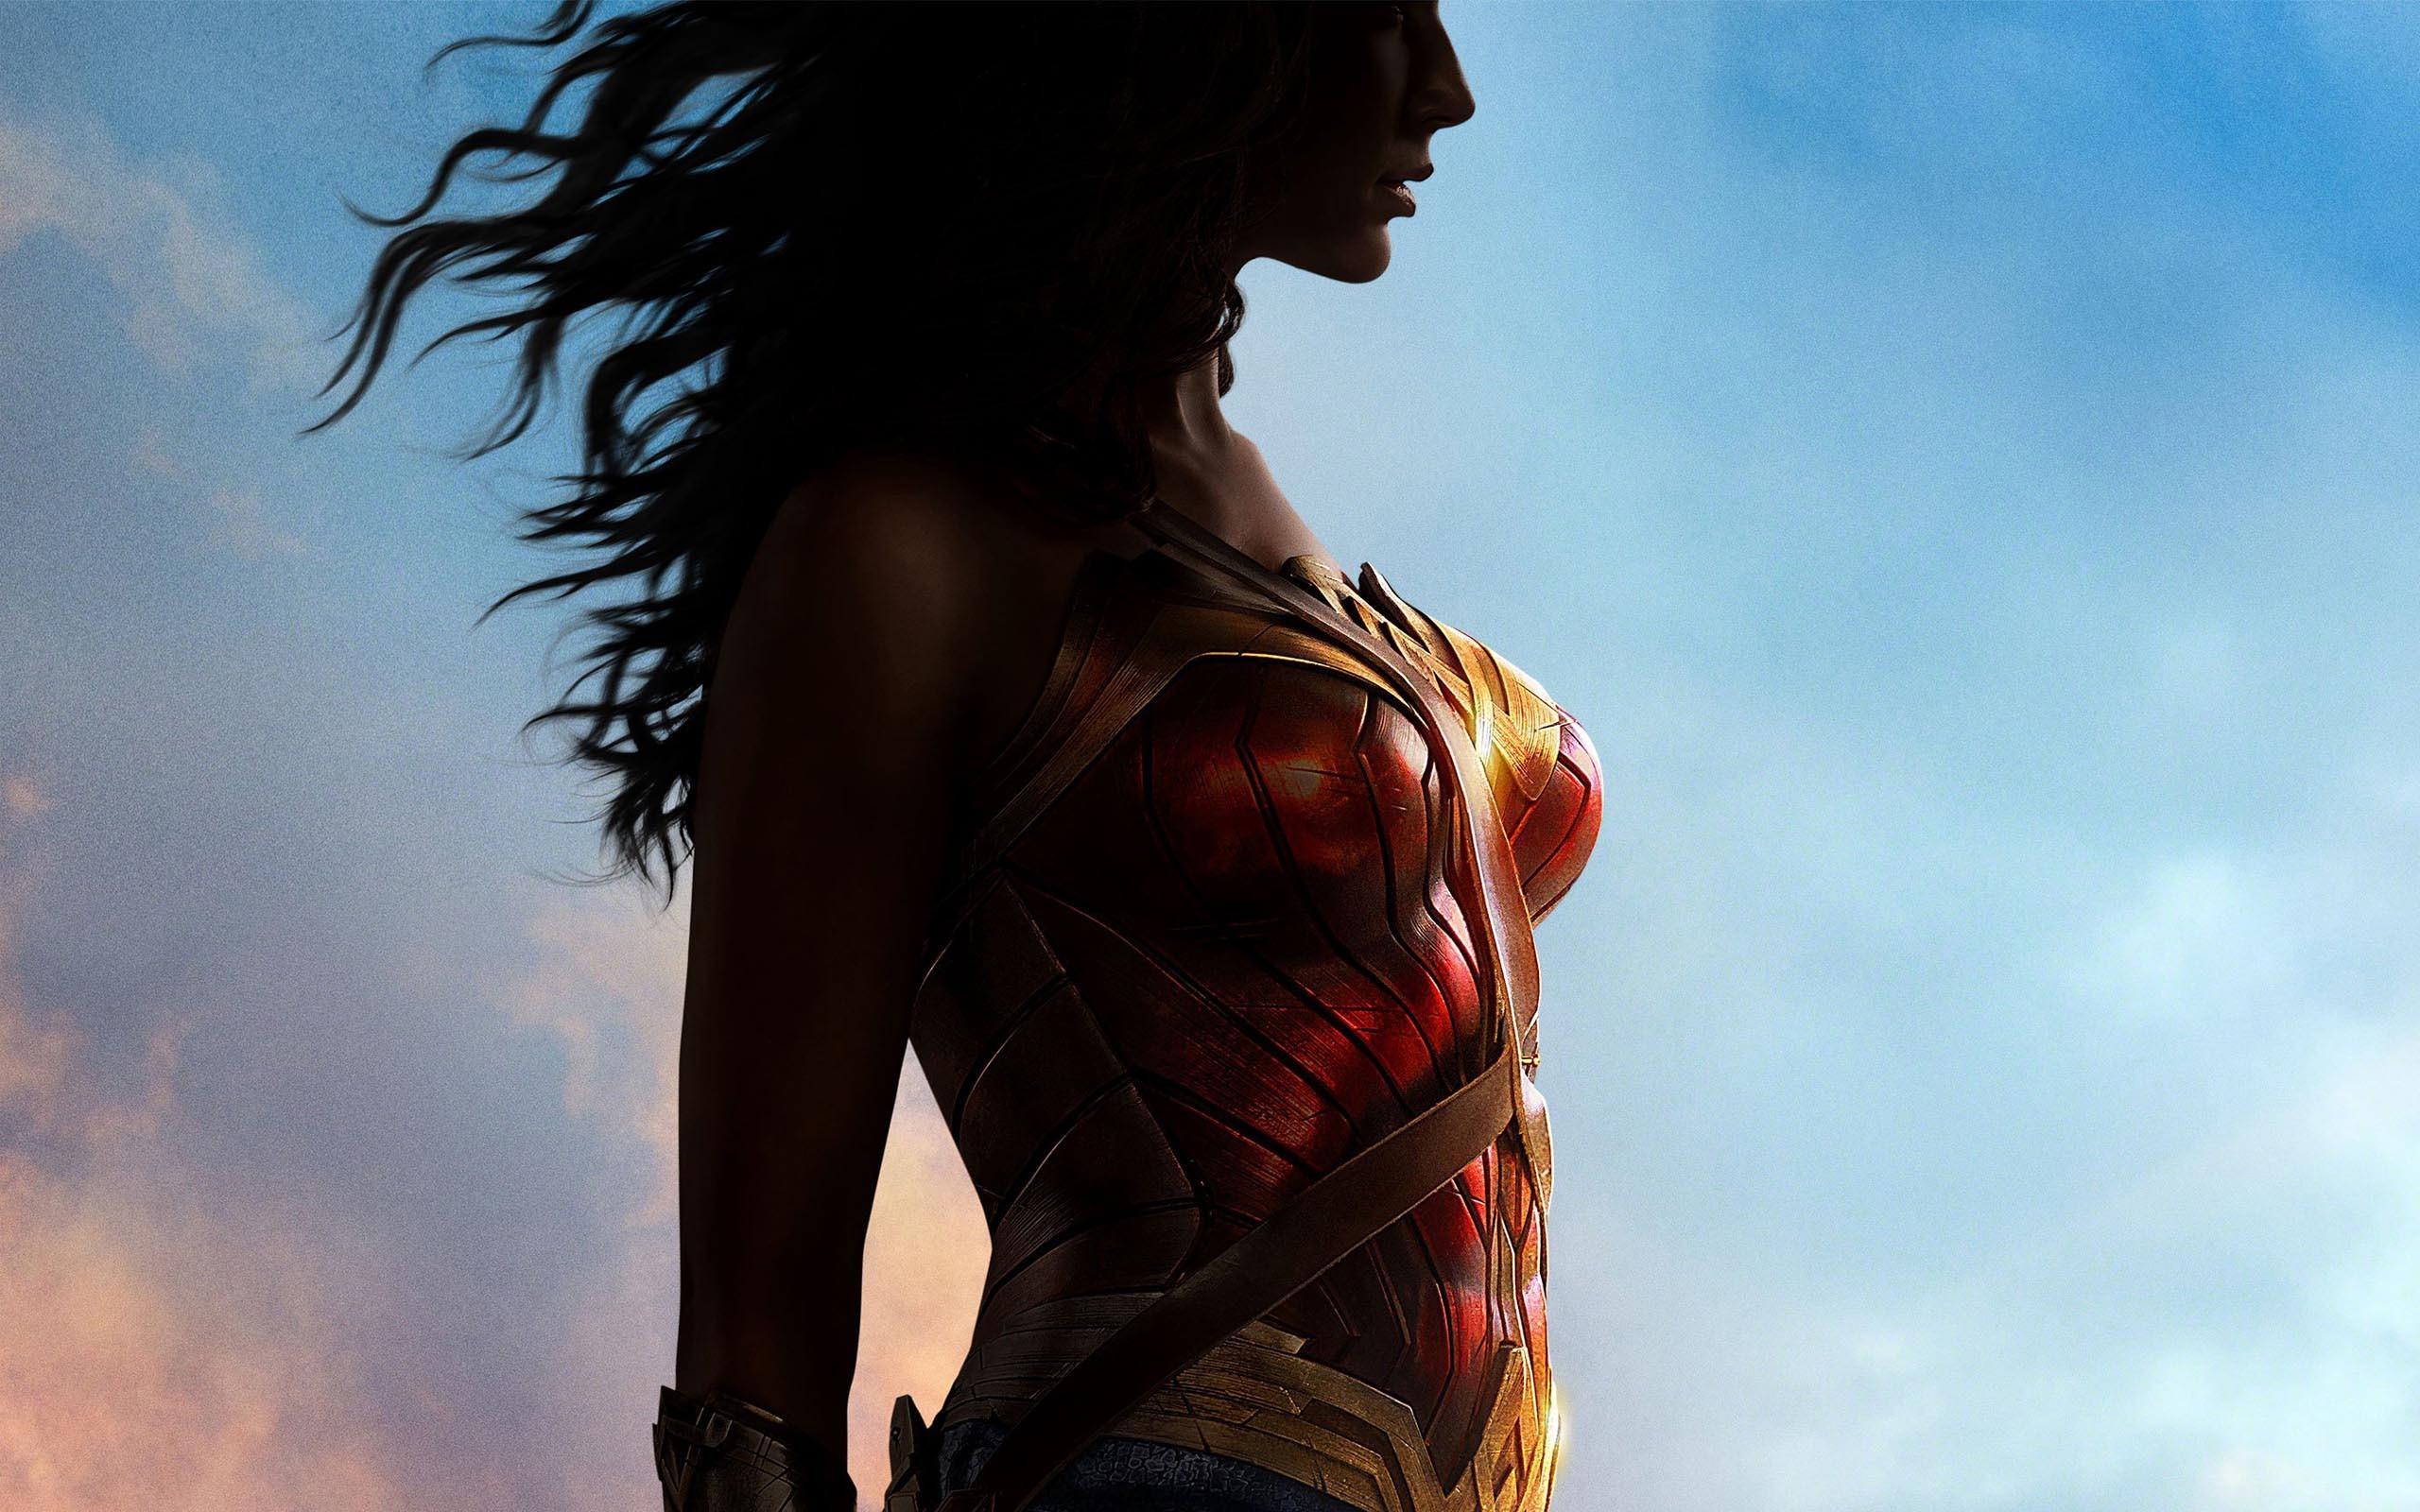 Wonder Woman Gal Gadot 2017 Movie wallpaper